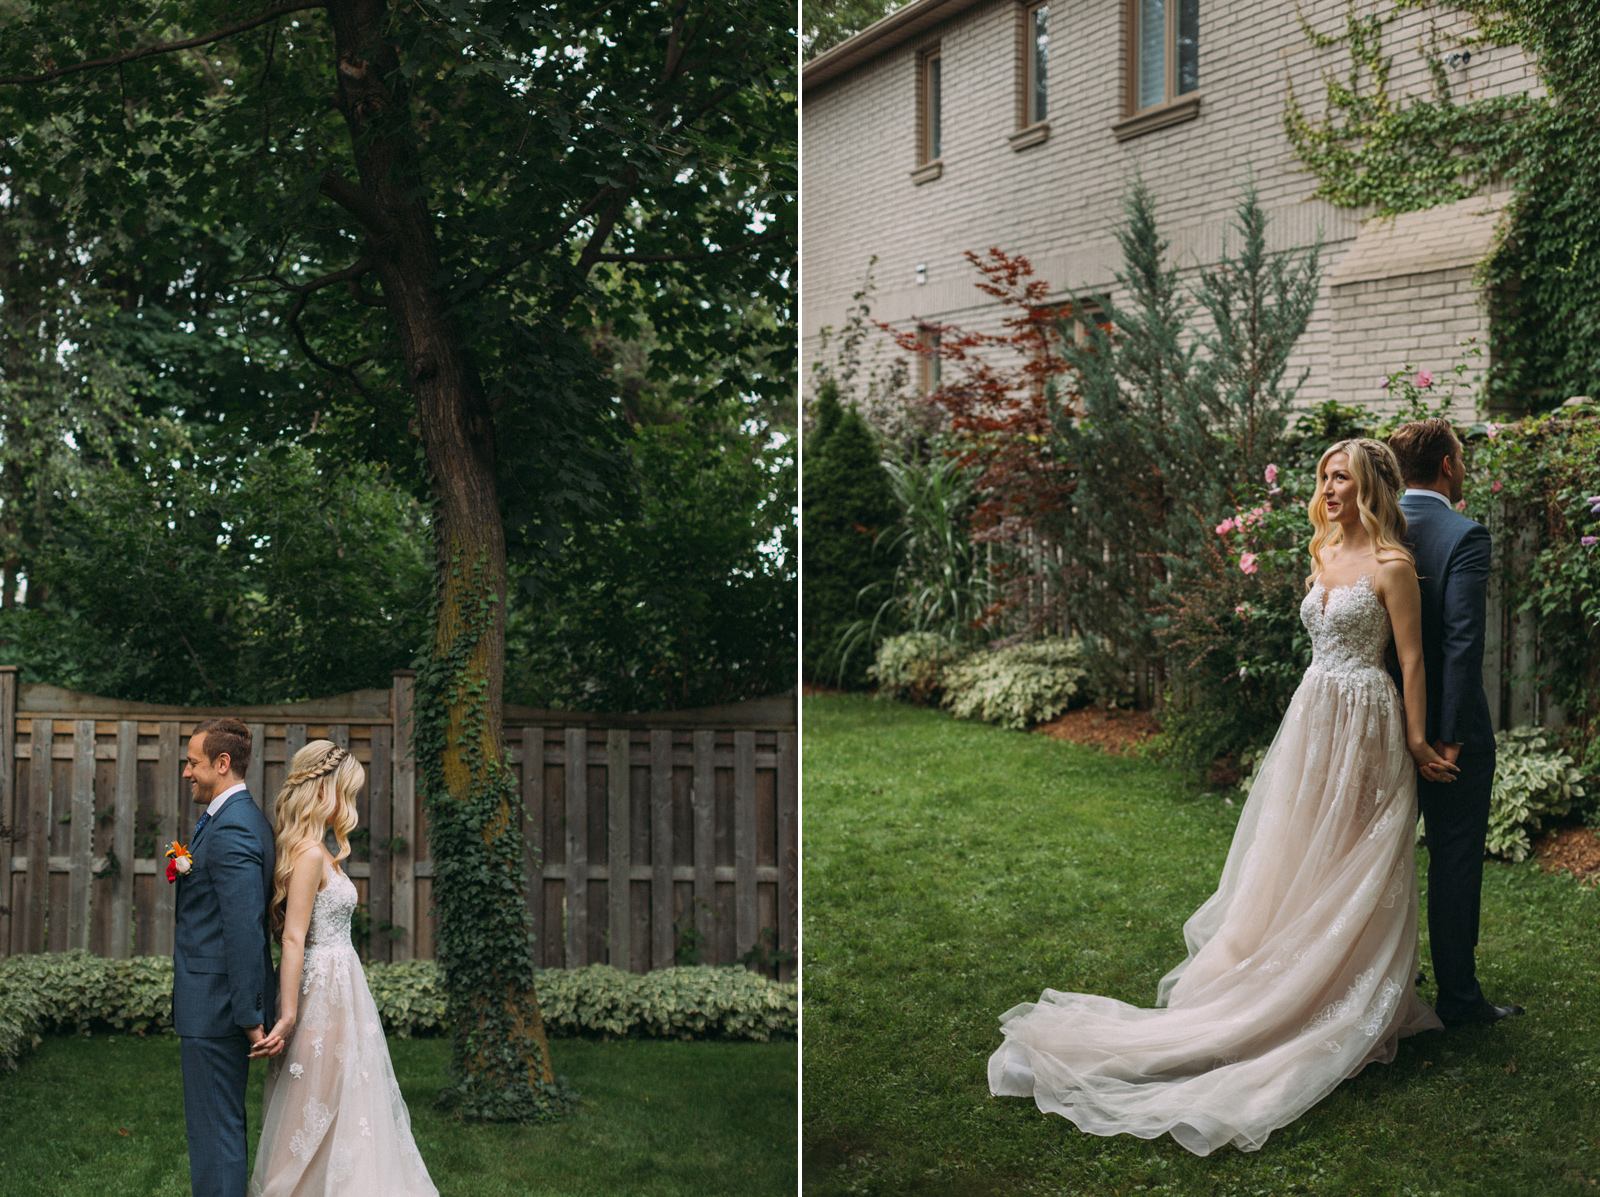 La-Maquette-wedding-by-Toronto-modern-wedding-photographer-Sam-Wong_12.jpg